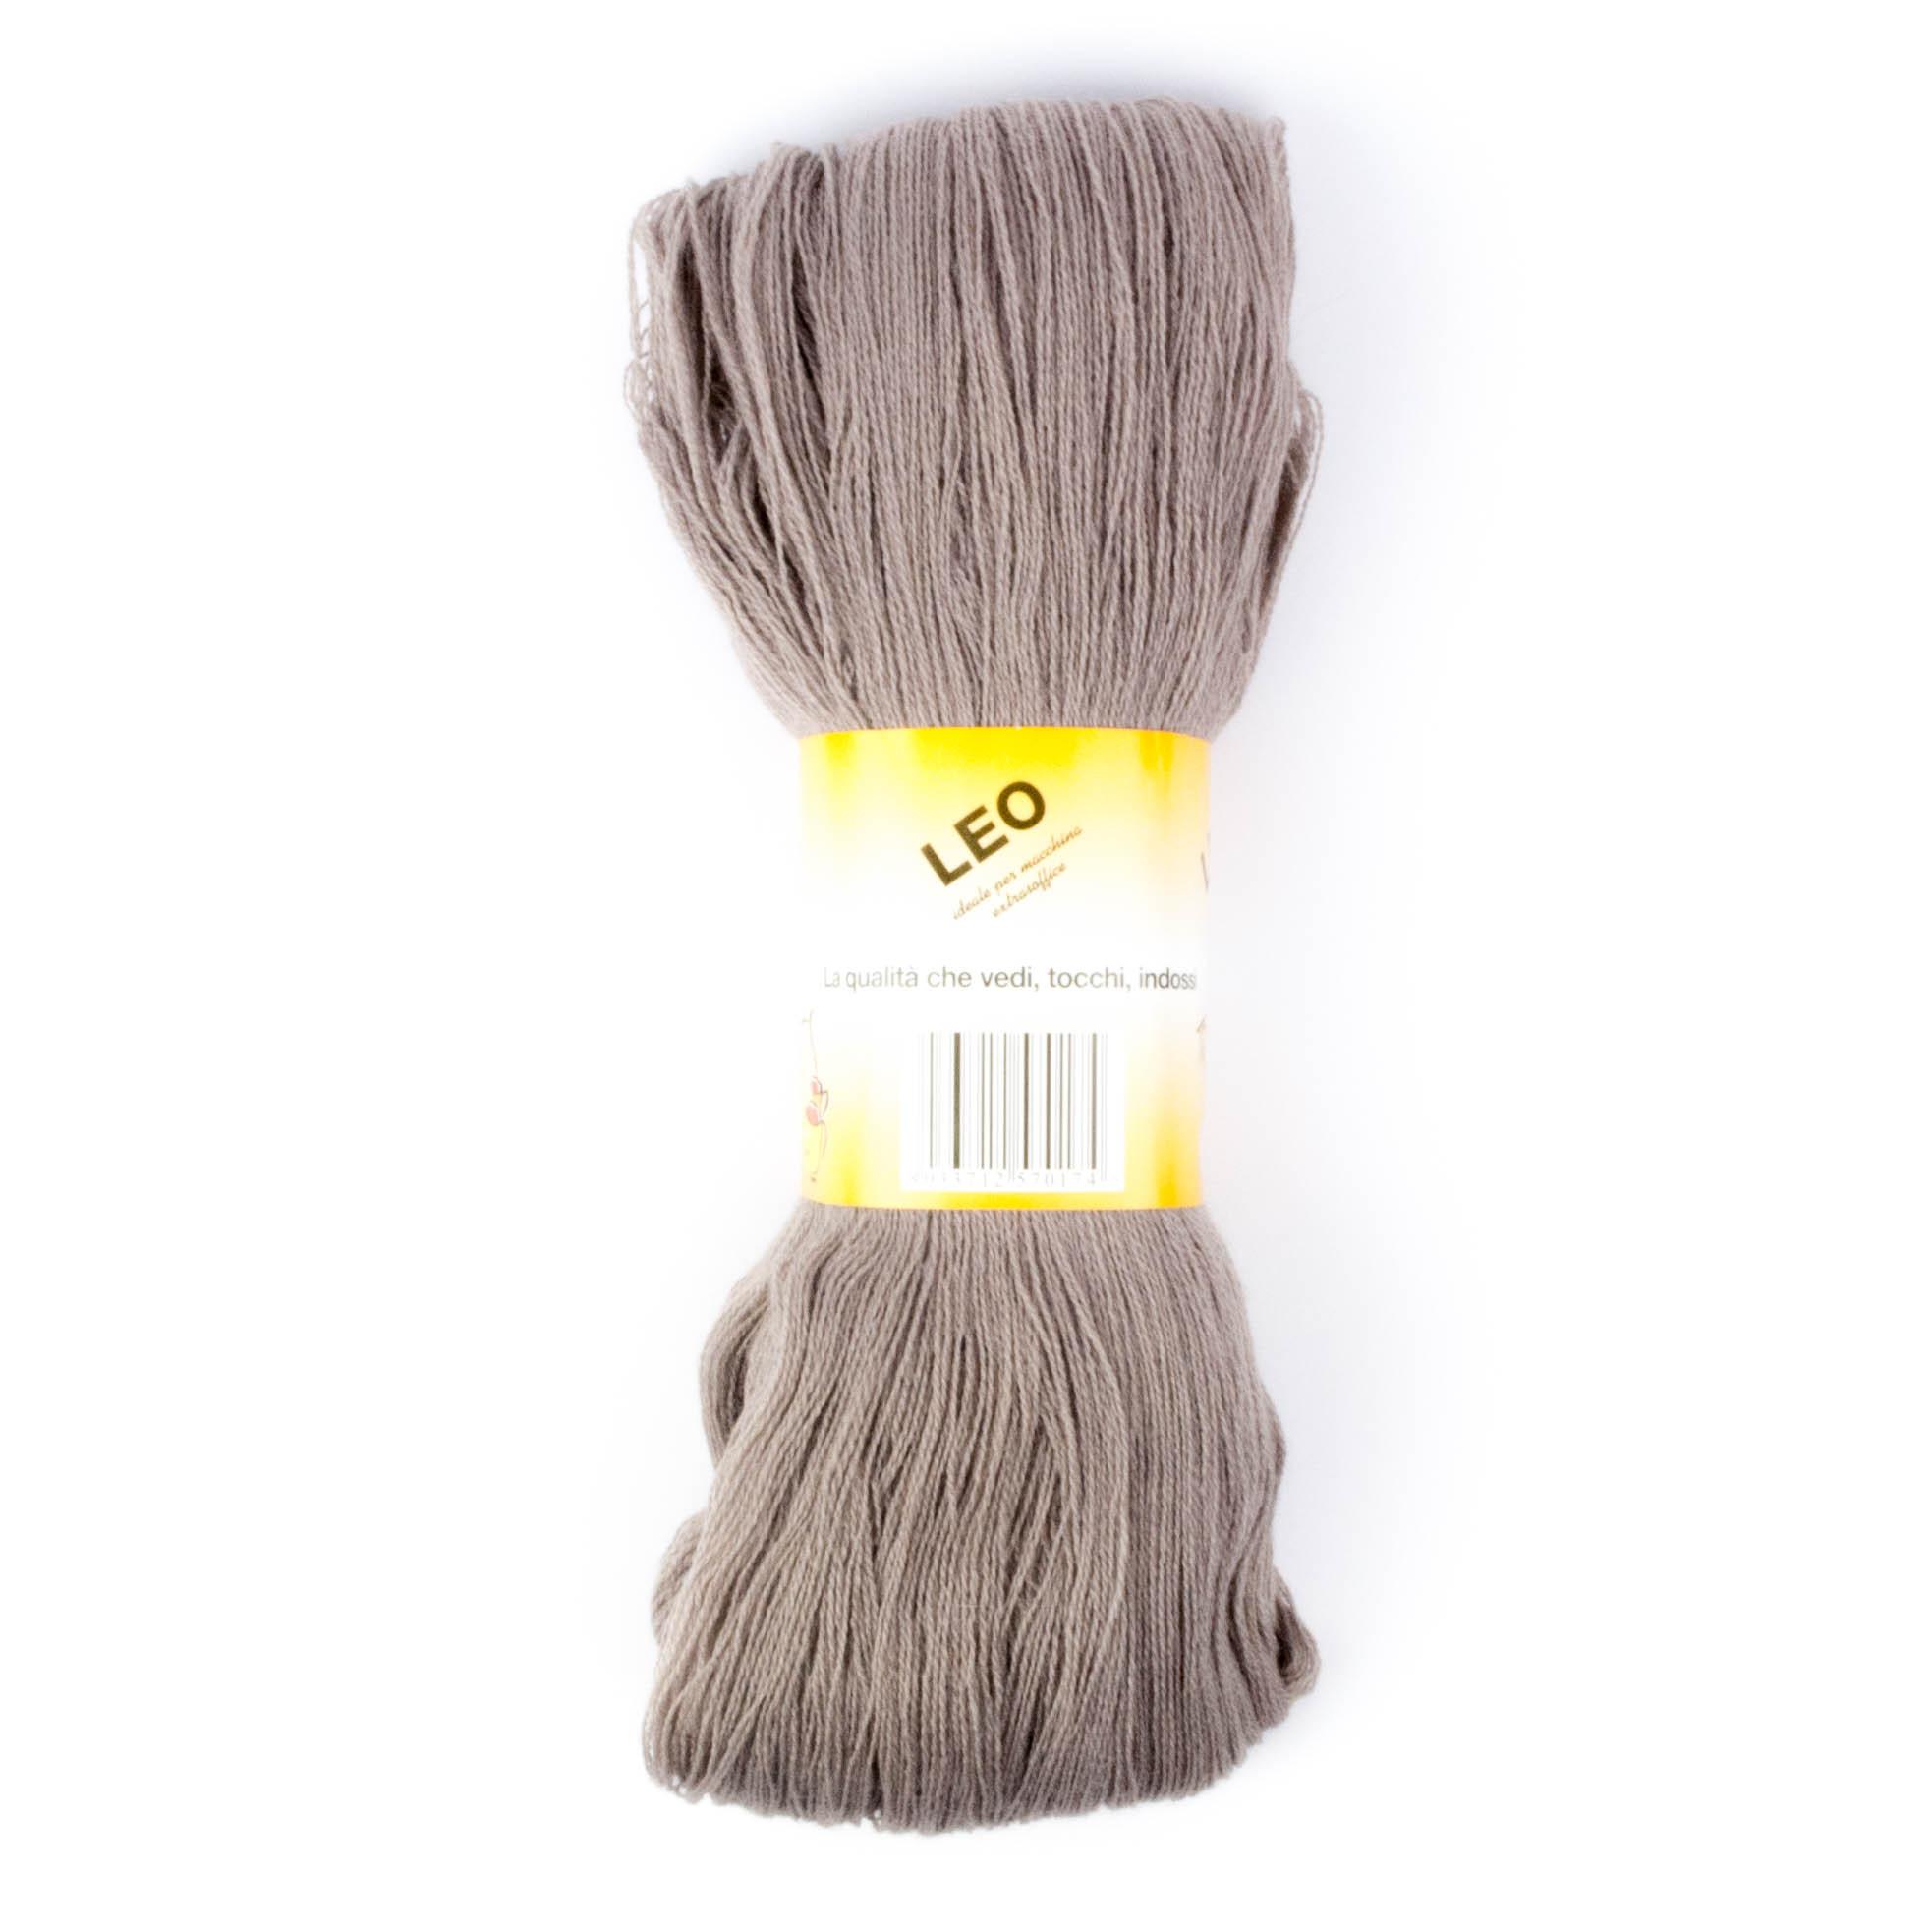 Leo - Matassa misto lana ideale per lavori a mano e macchina - Tortora 46